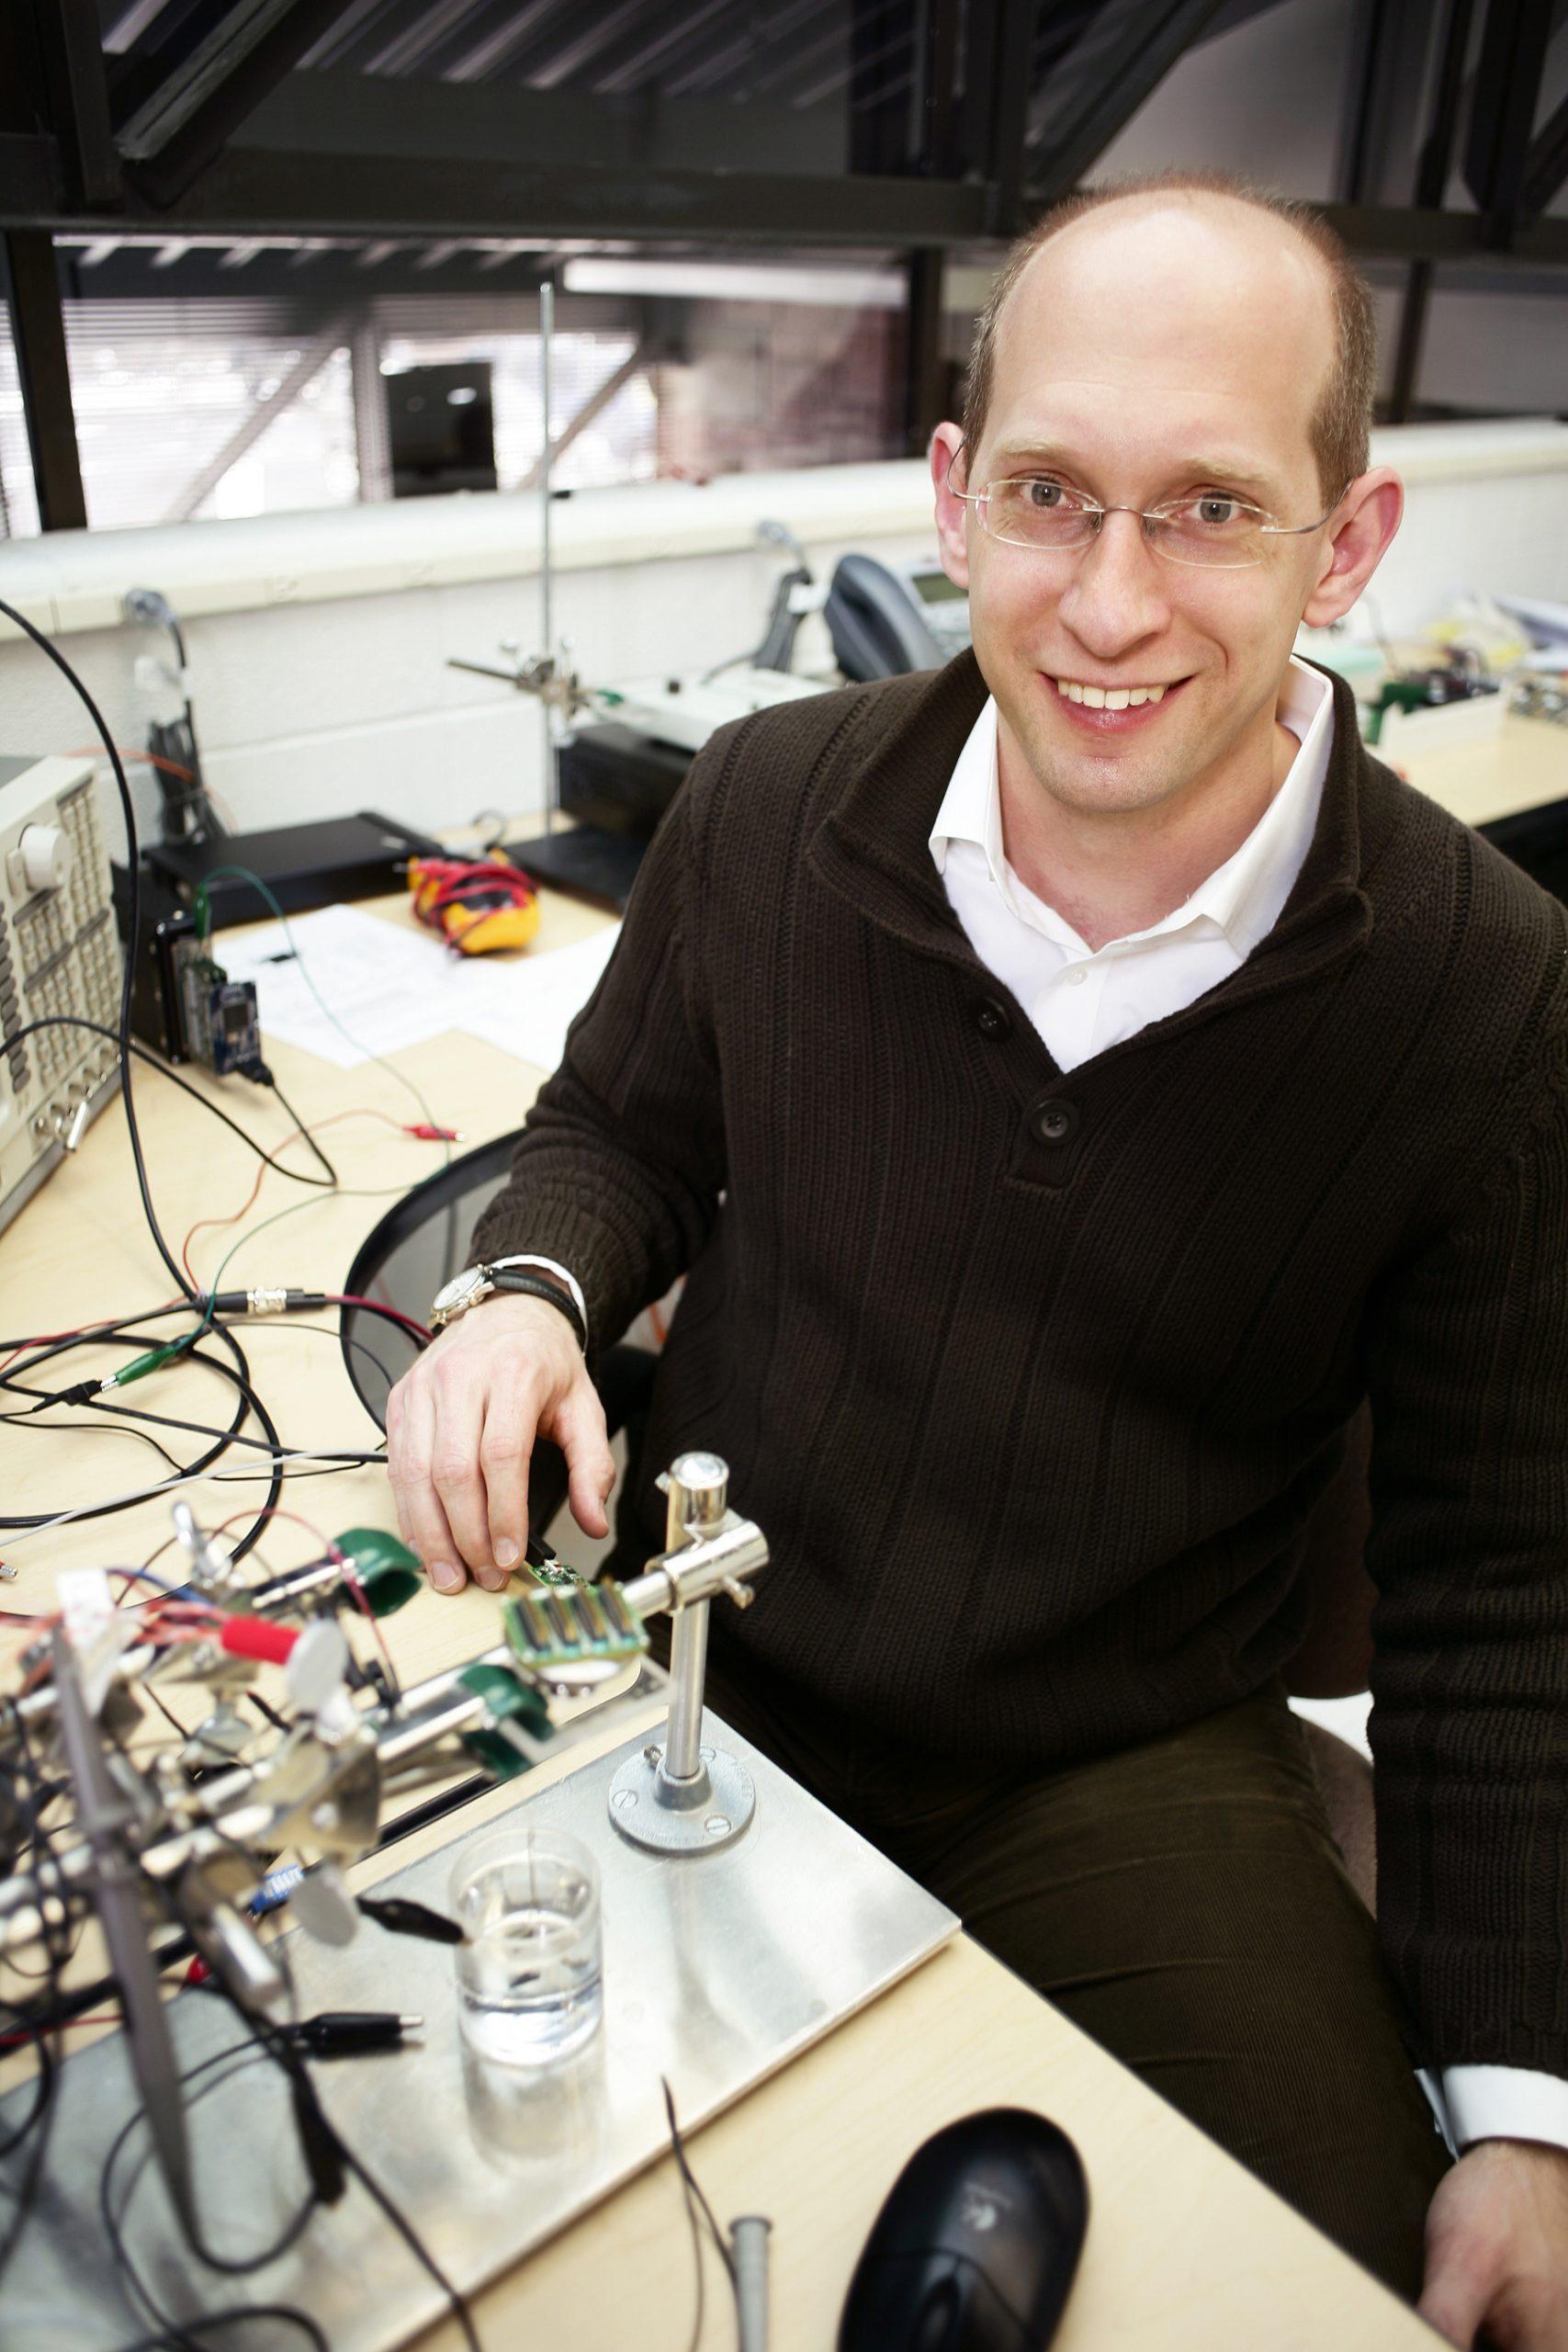 Winner of the 2012 Innovation and Impact Award, Florian Solzbacher.